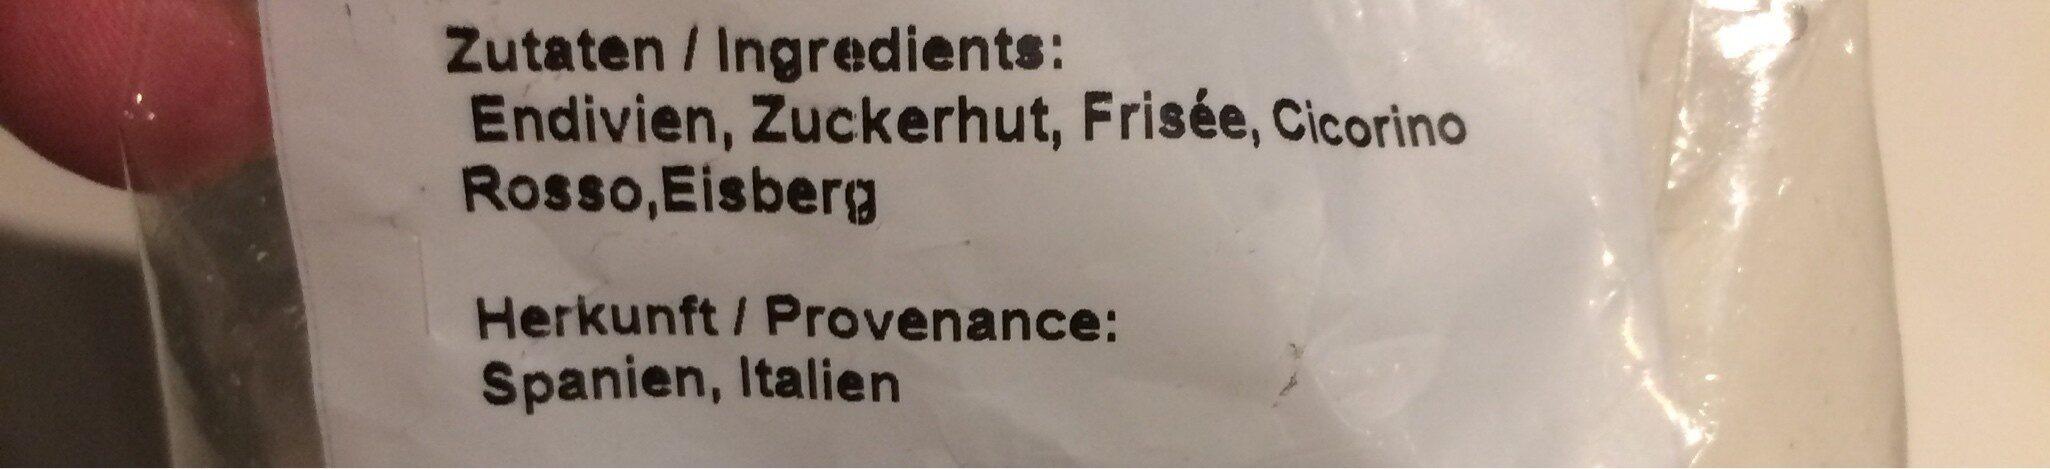 Mélange de salades - Ingredients